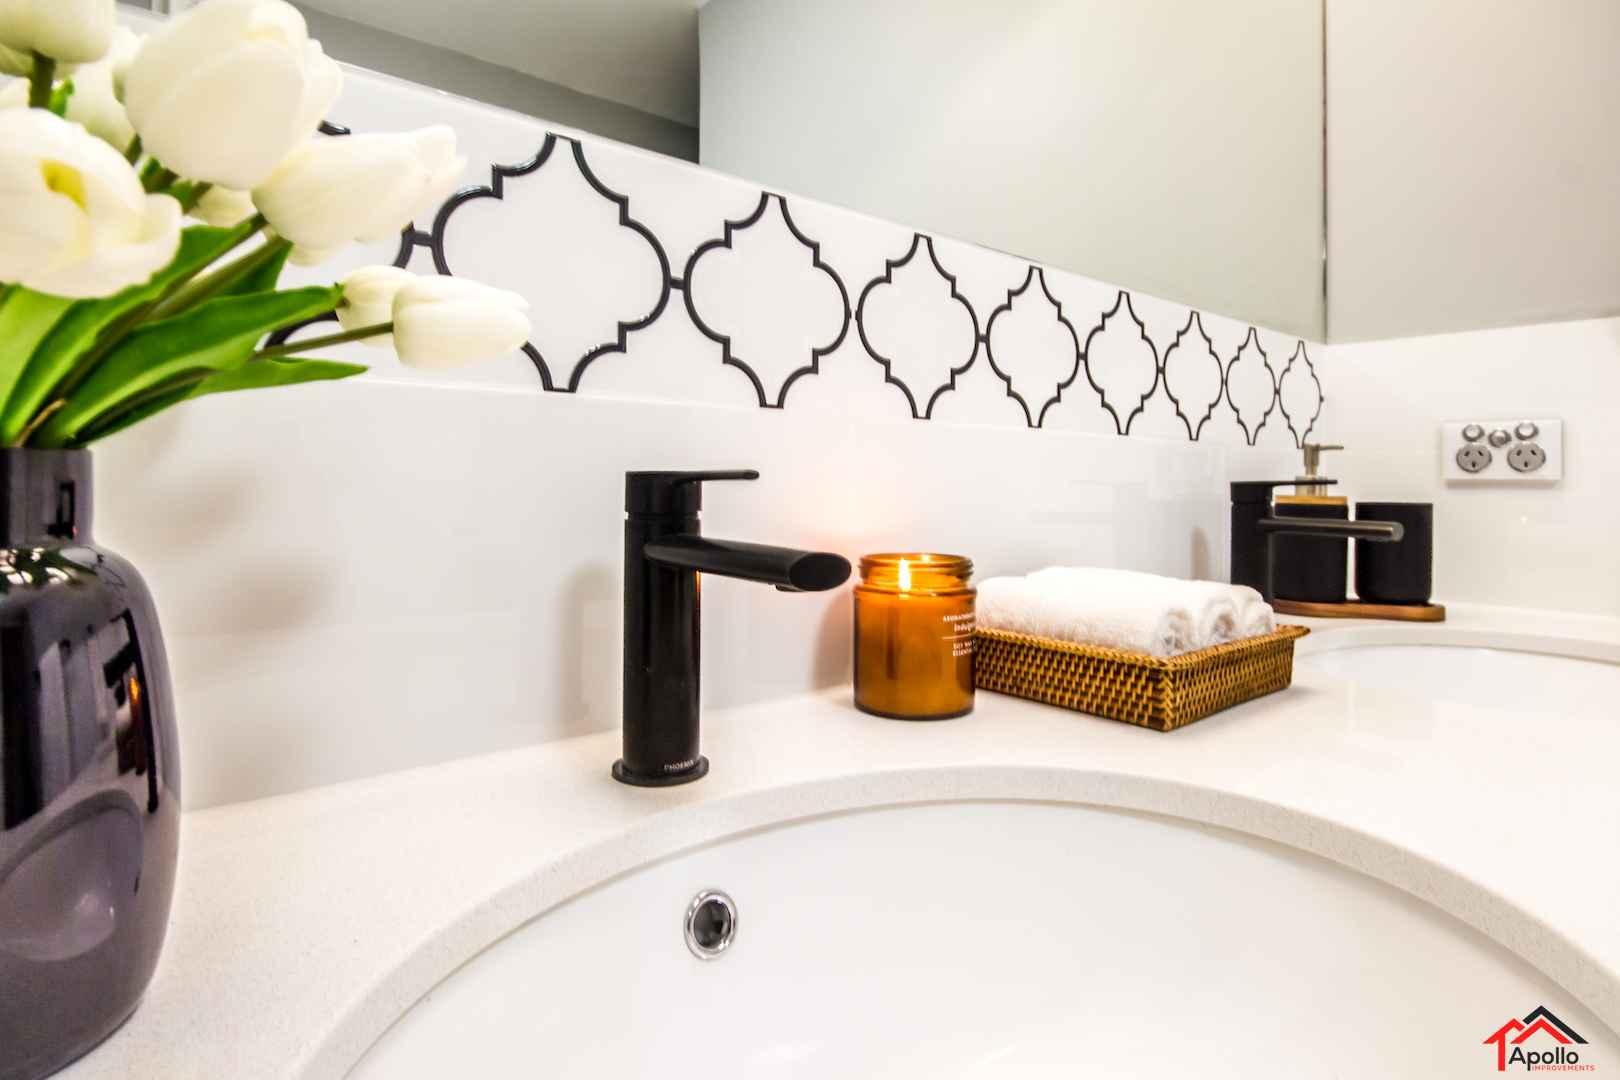 South Perth Apartment Bathroom Remodel